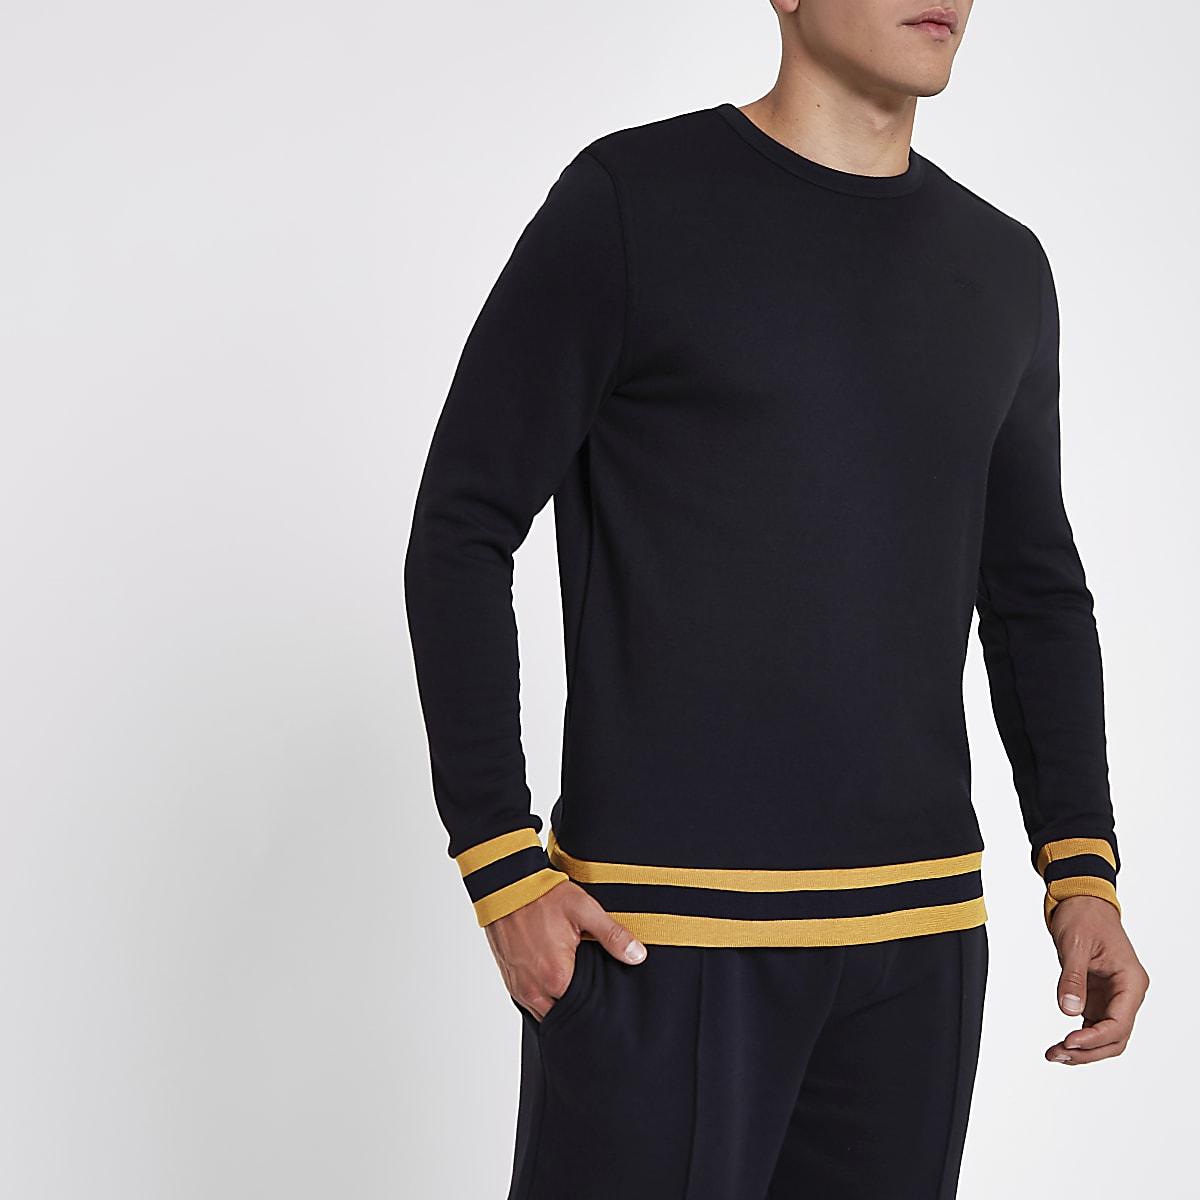 Marineblauwe slim-fit sweater met ronde hals